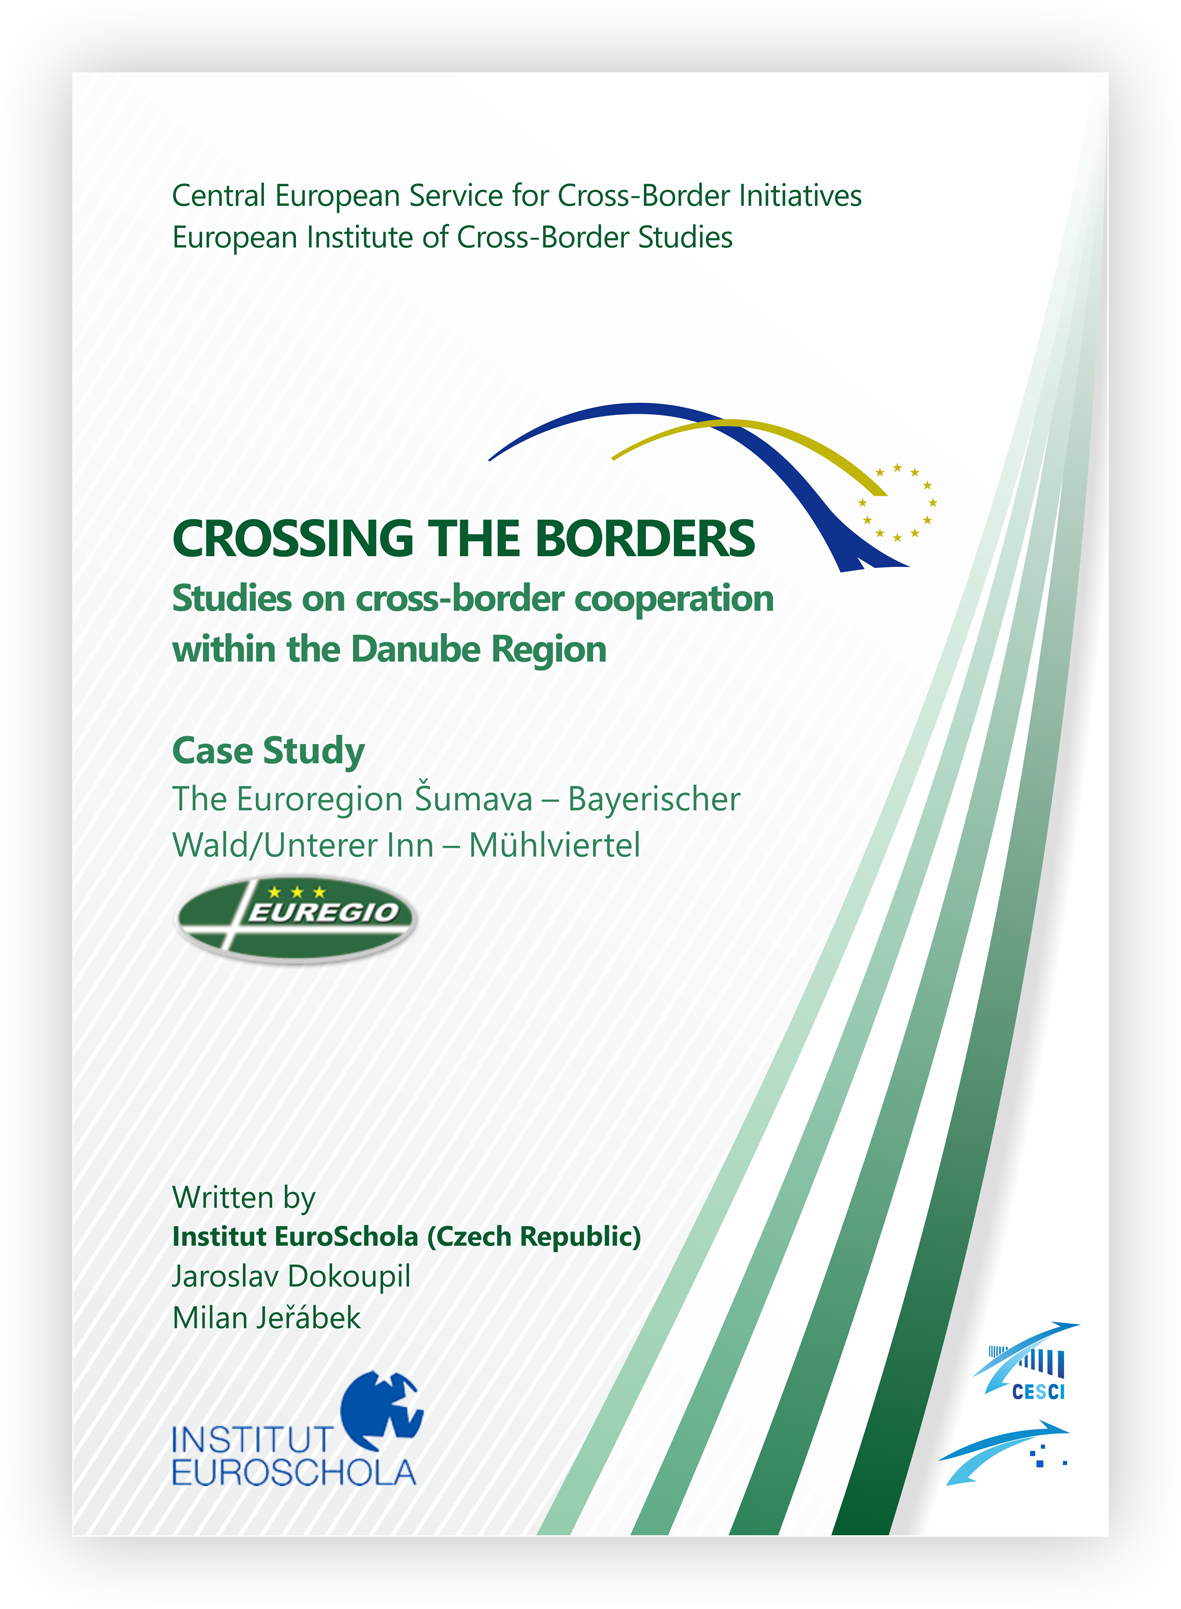 Case Study: The Euroregion Šumava – Bayerischer Wald/Unterer Inn – Mühlvierte